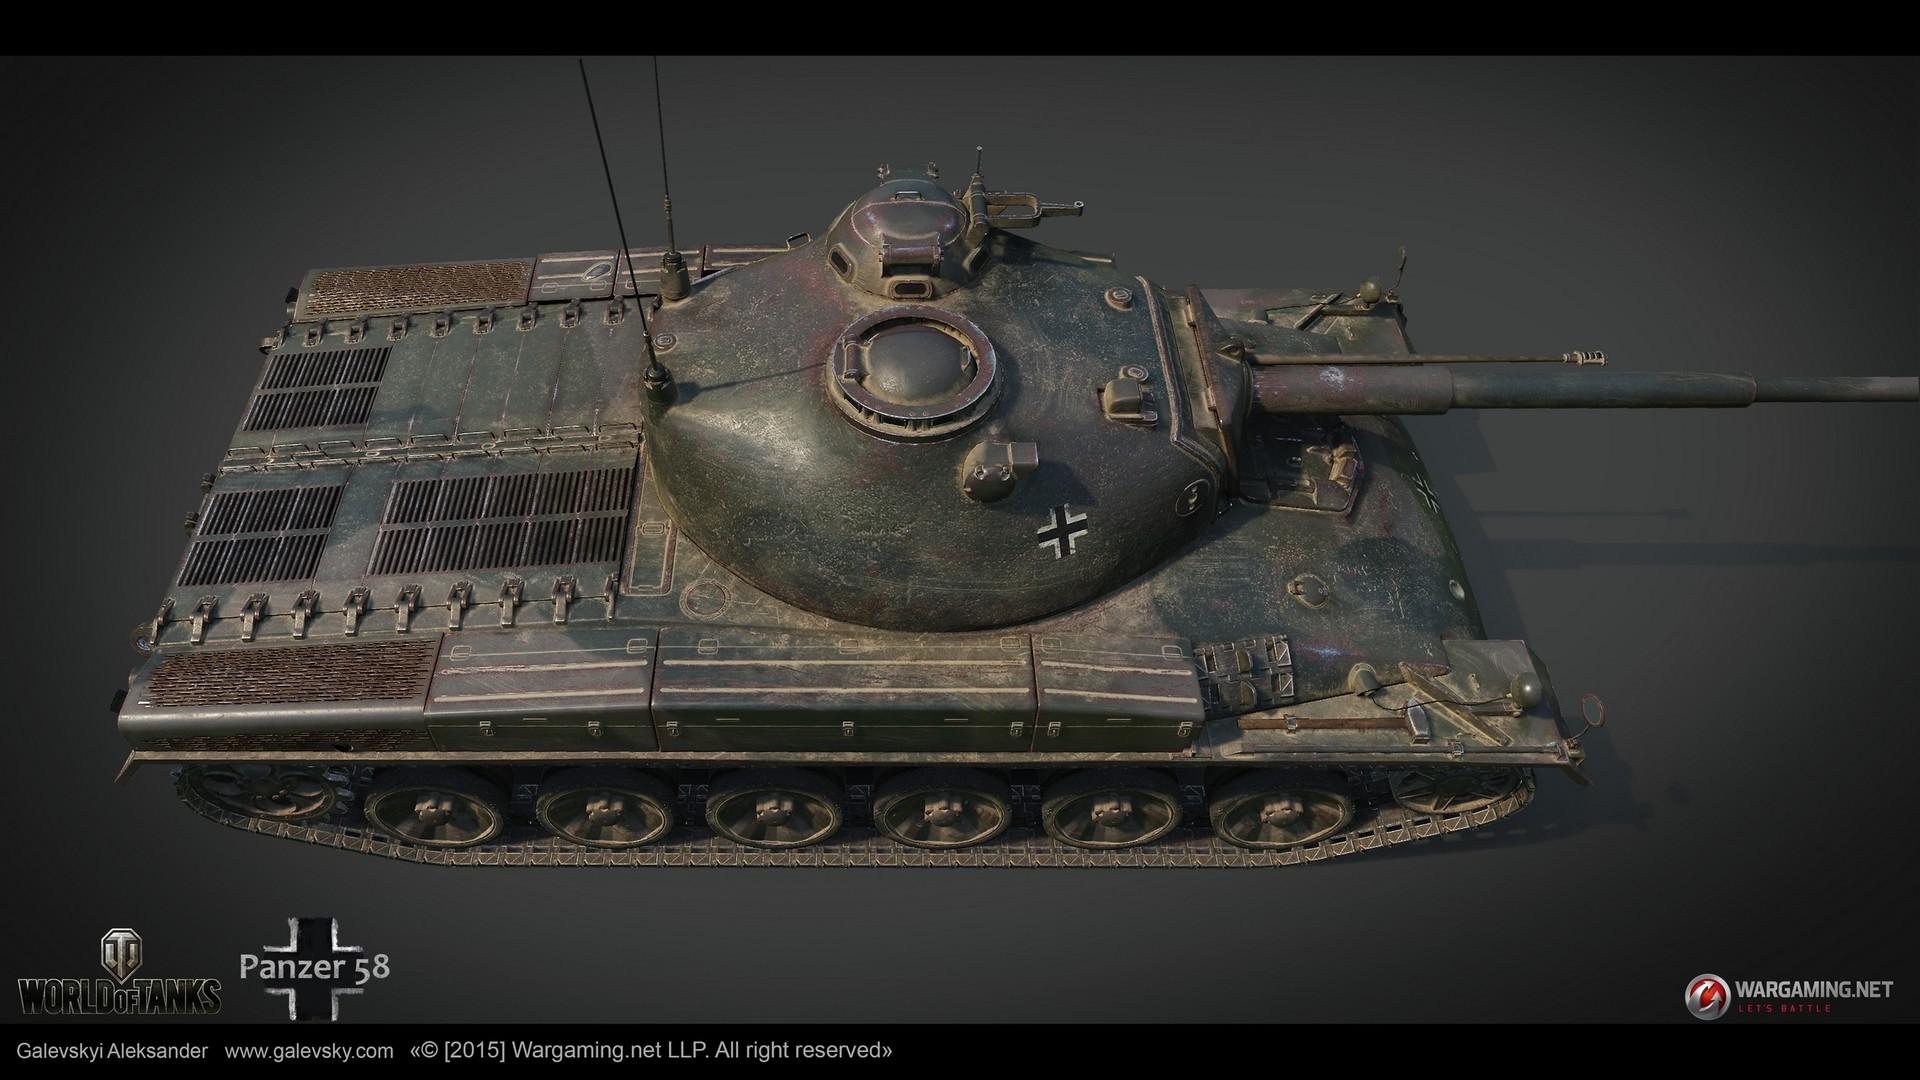 Aleksander galevskyi panzer 58 13 med